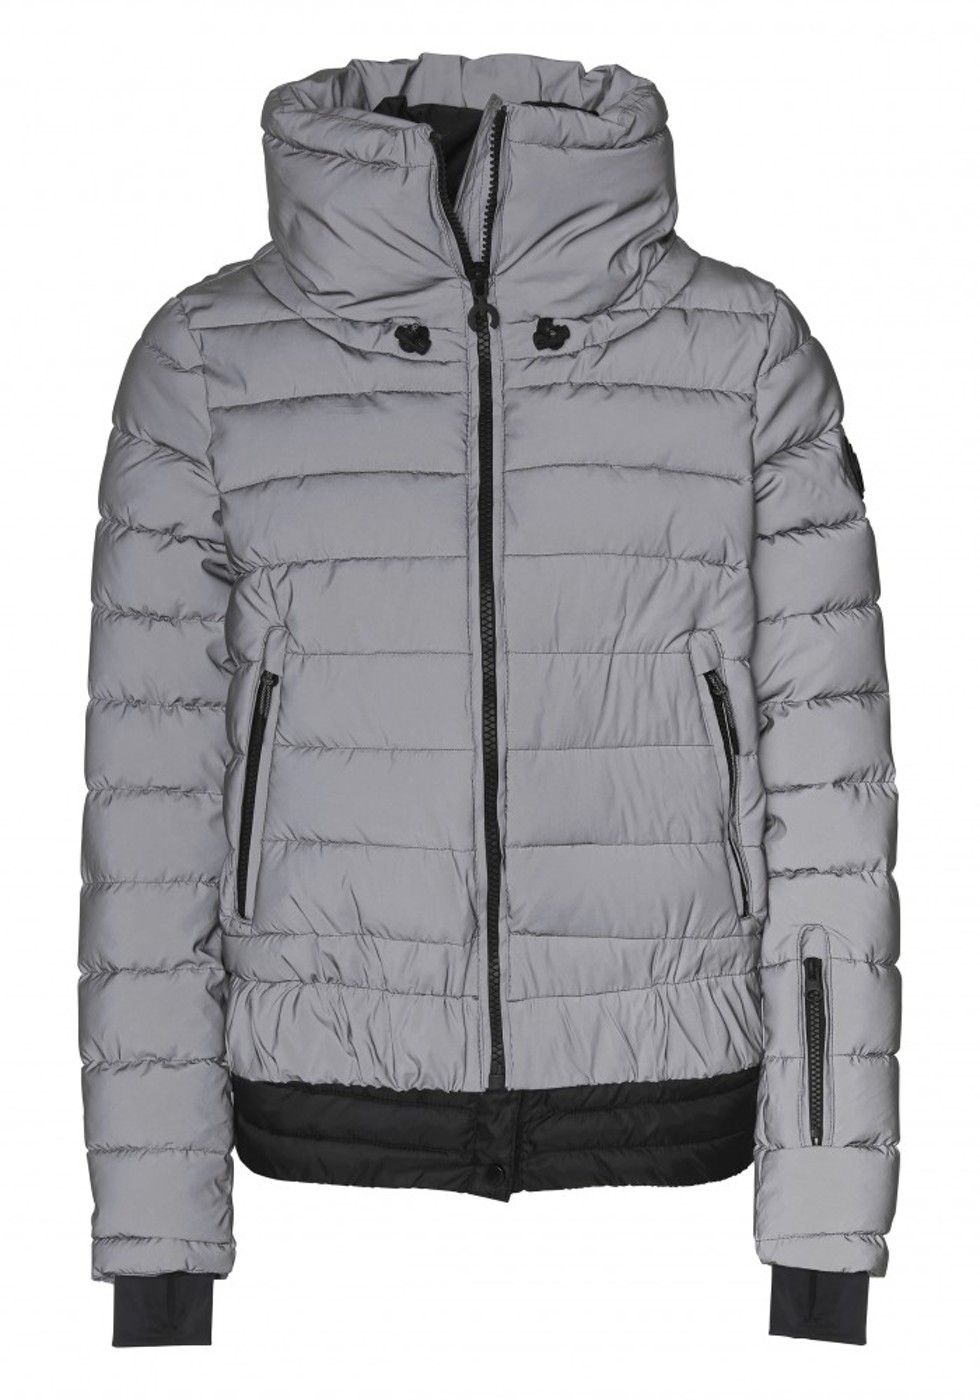 CHIEMSEE SIGUANG Padded Jacket - Damen